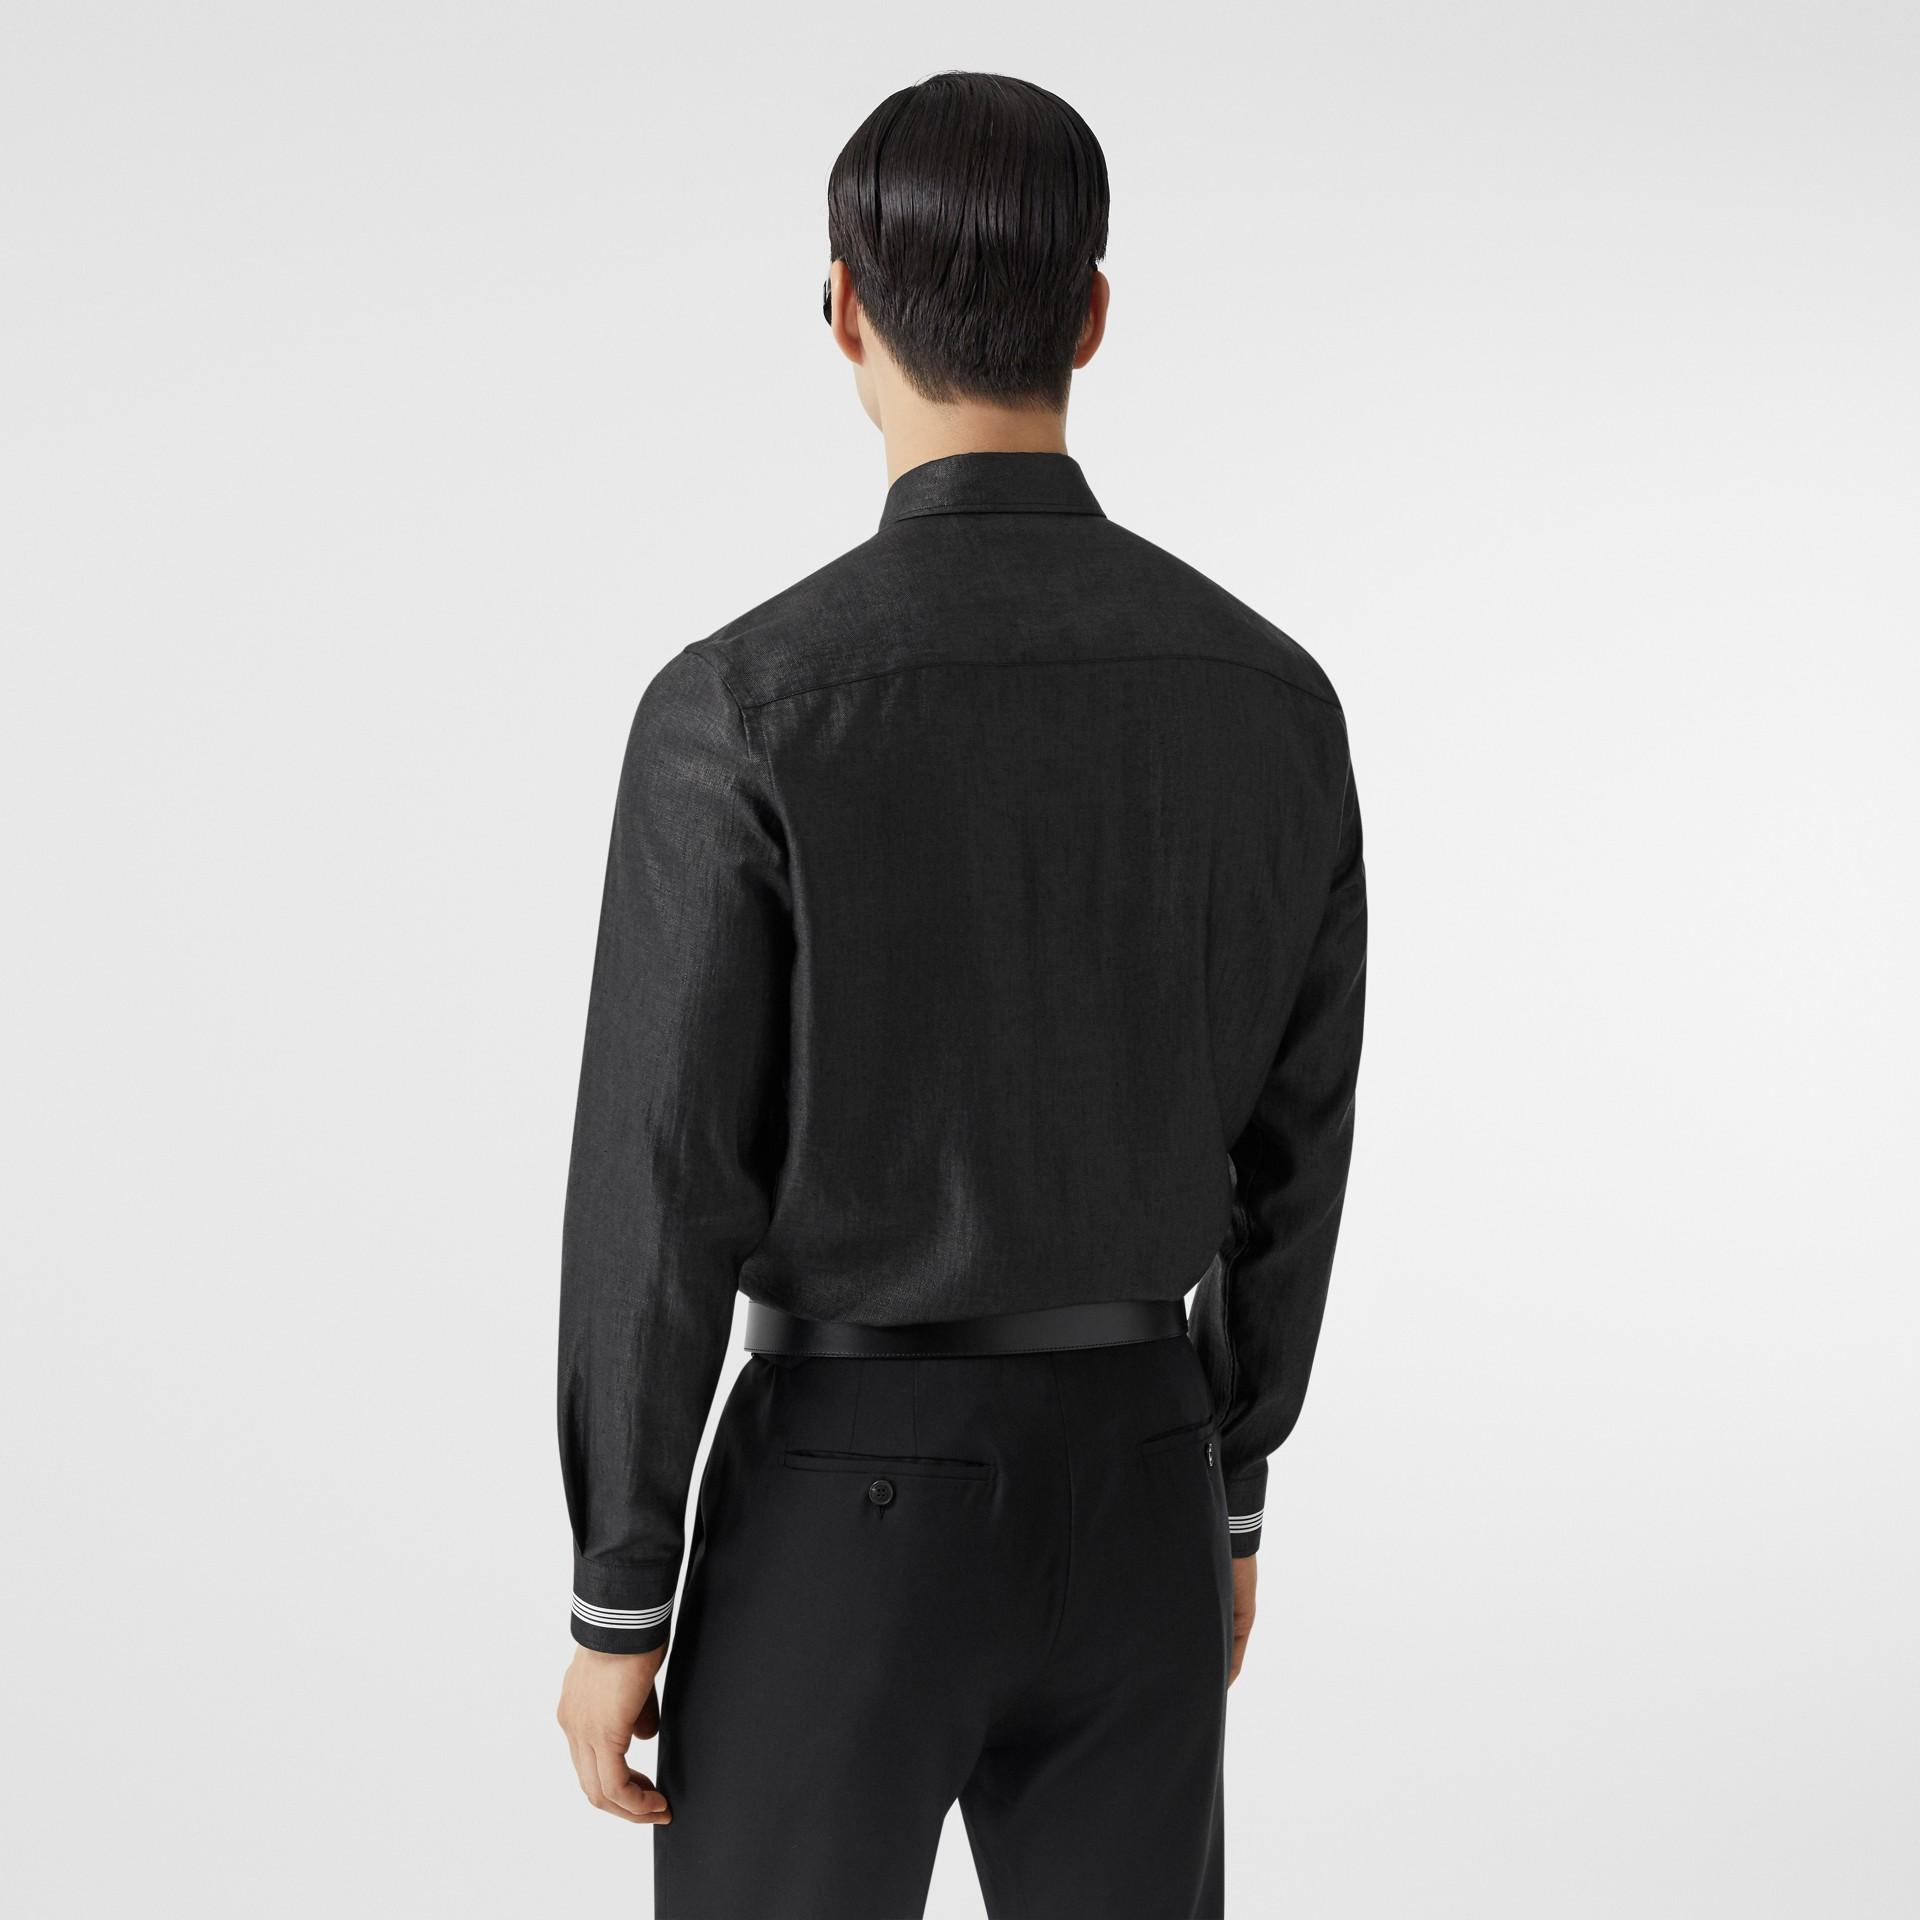 Logo Print Linen Blend Shirt in Black | Burberry - gallery image 2